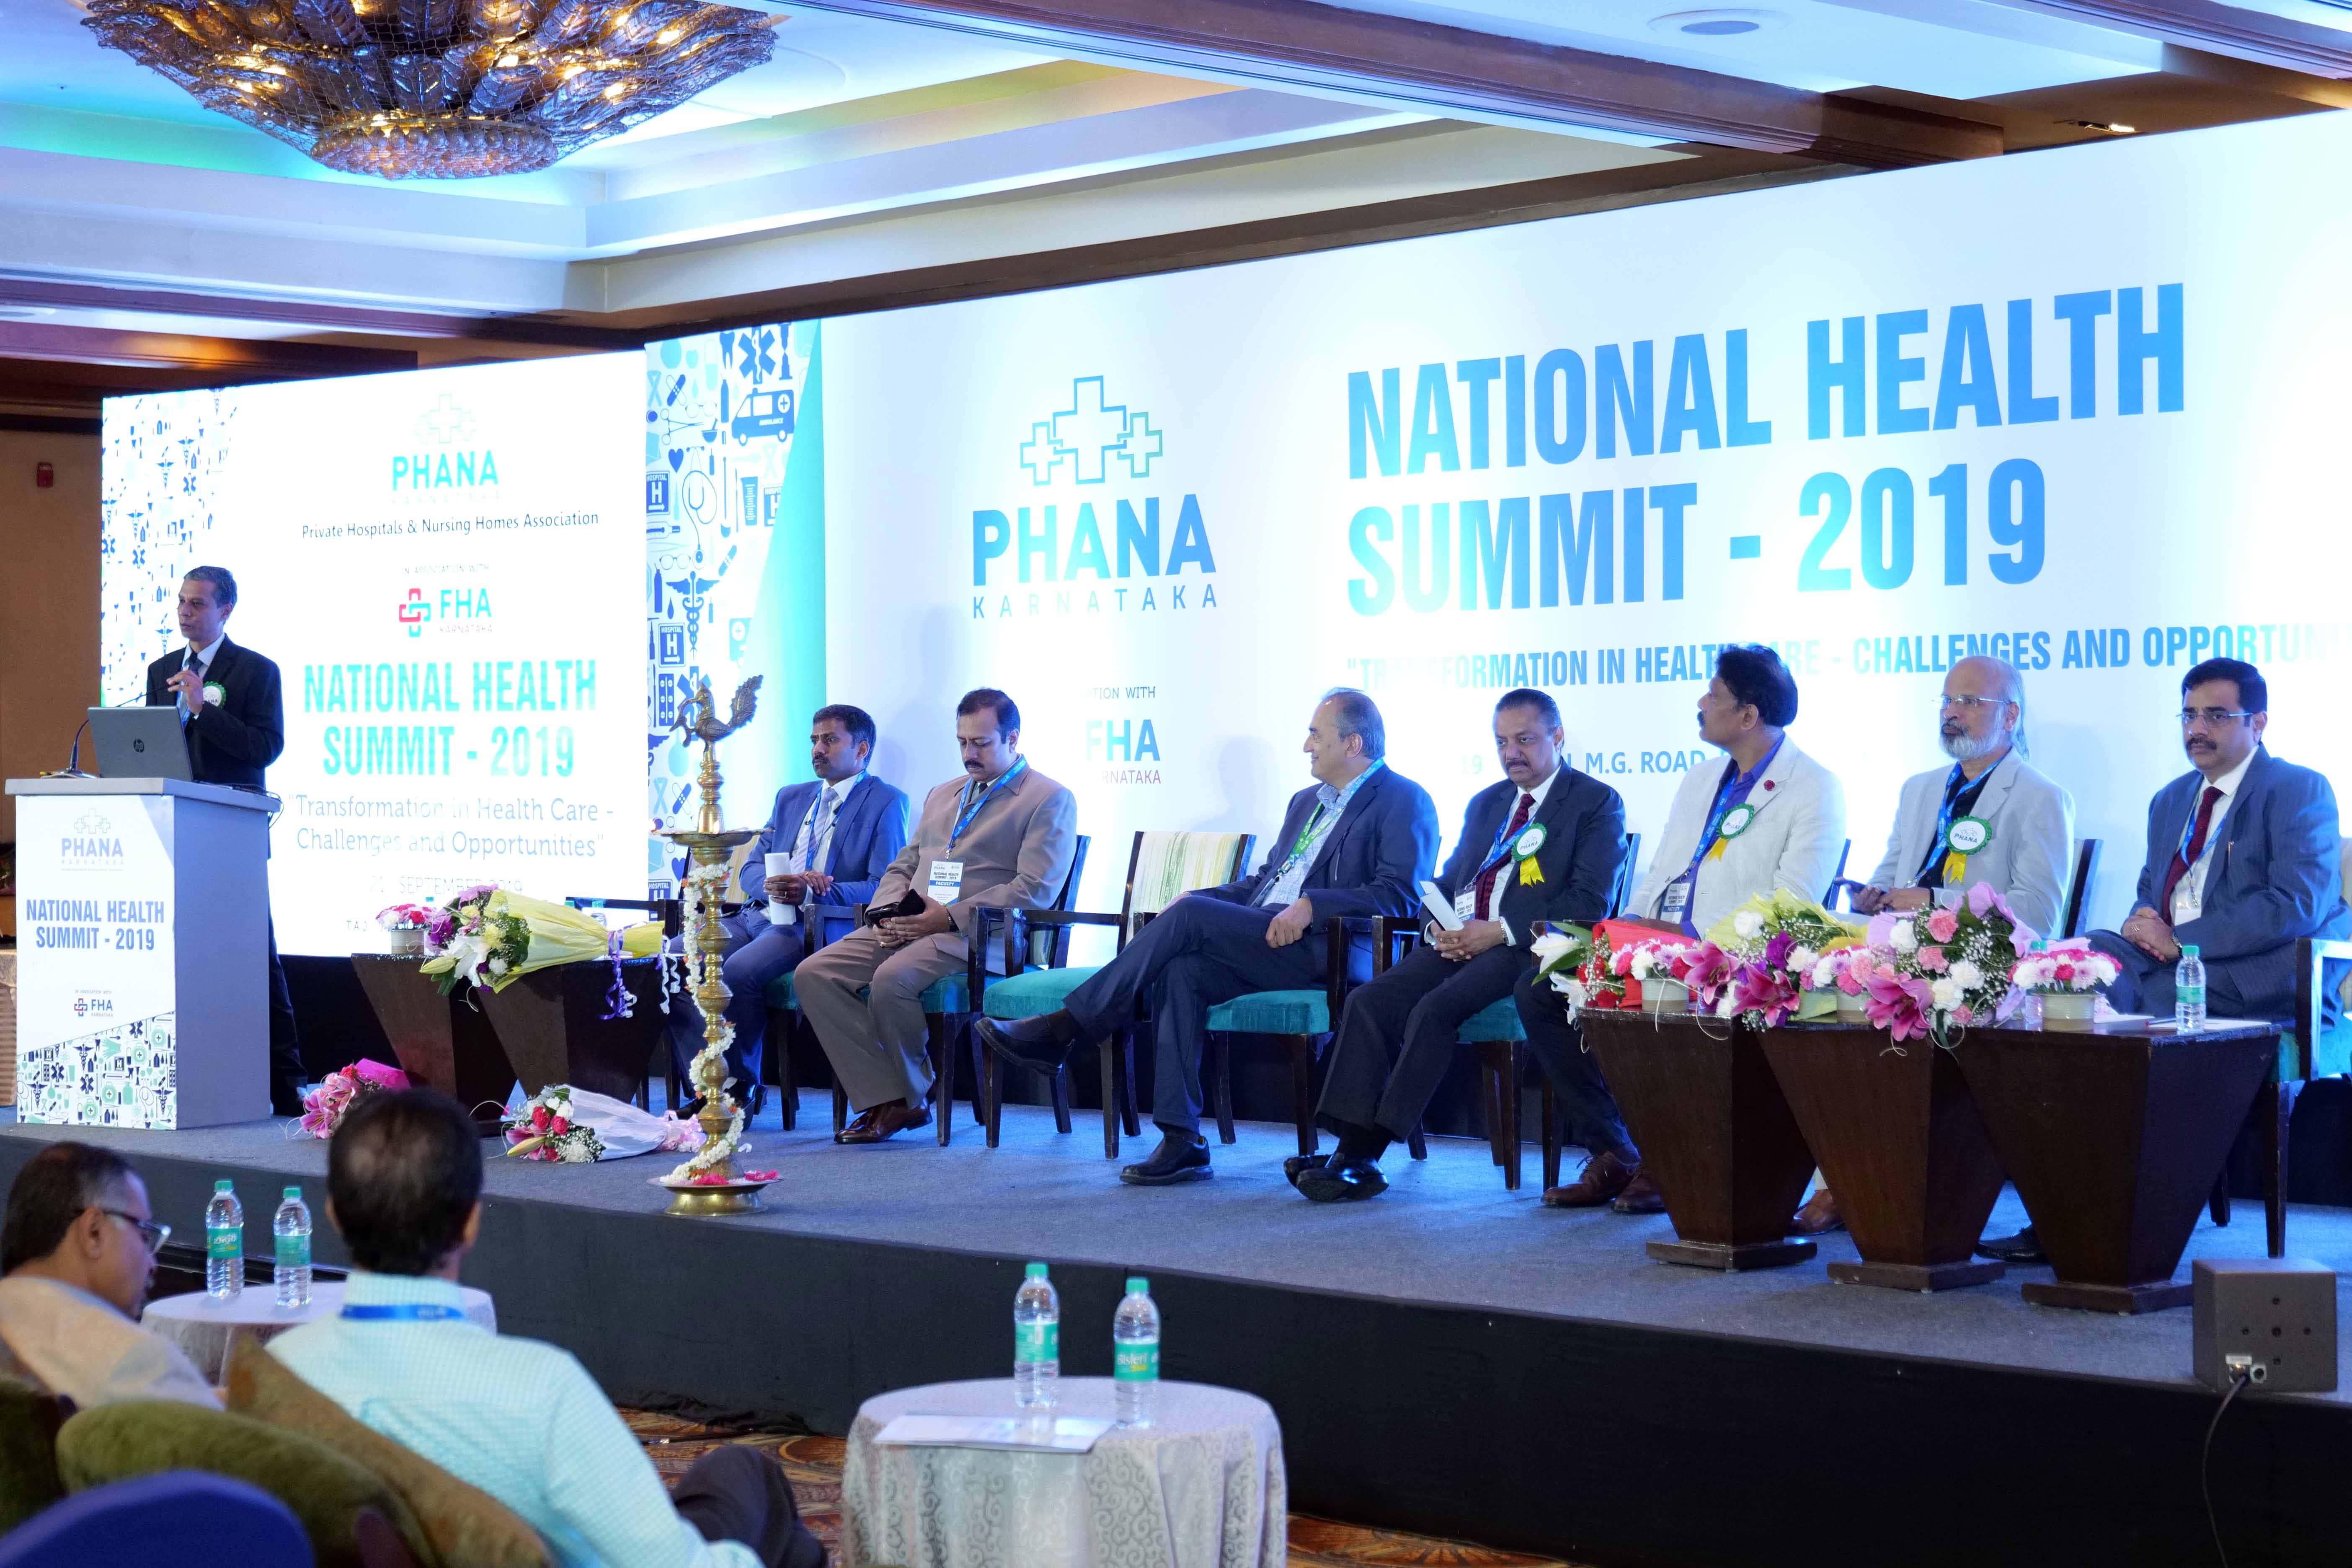 National Health Summit 2019